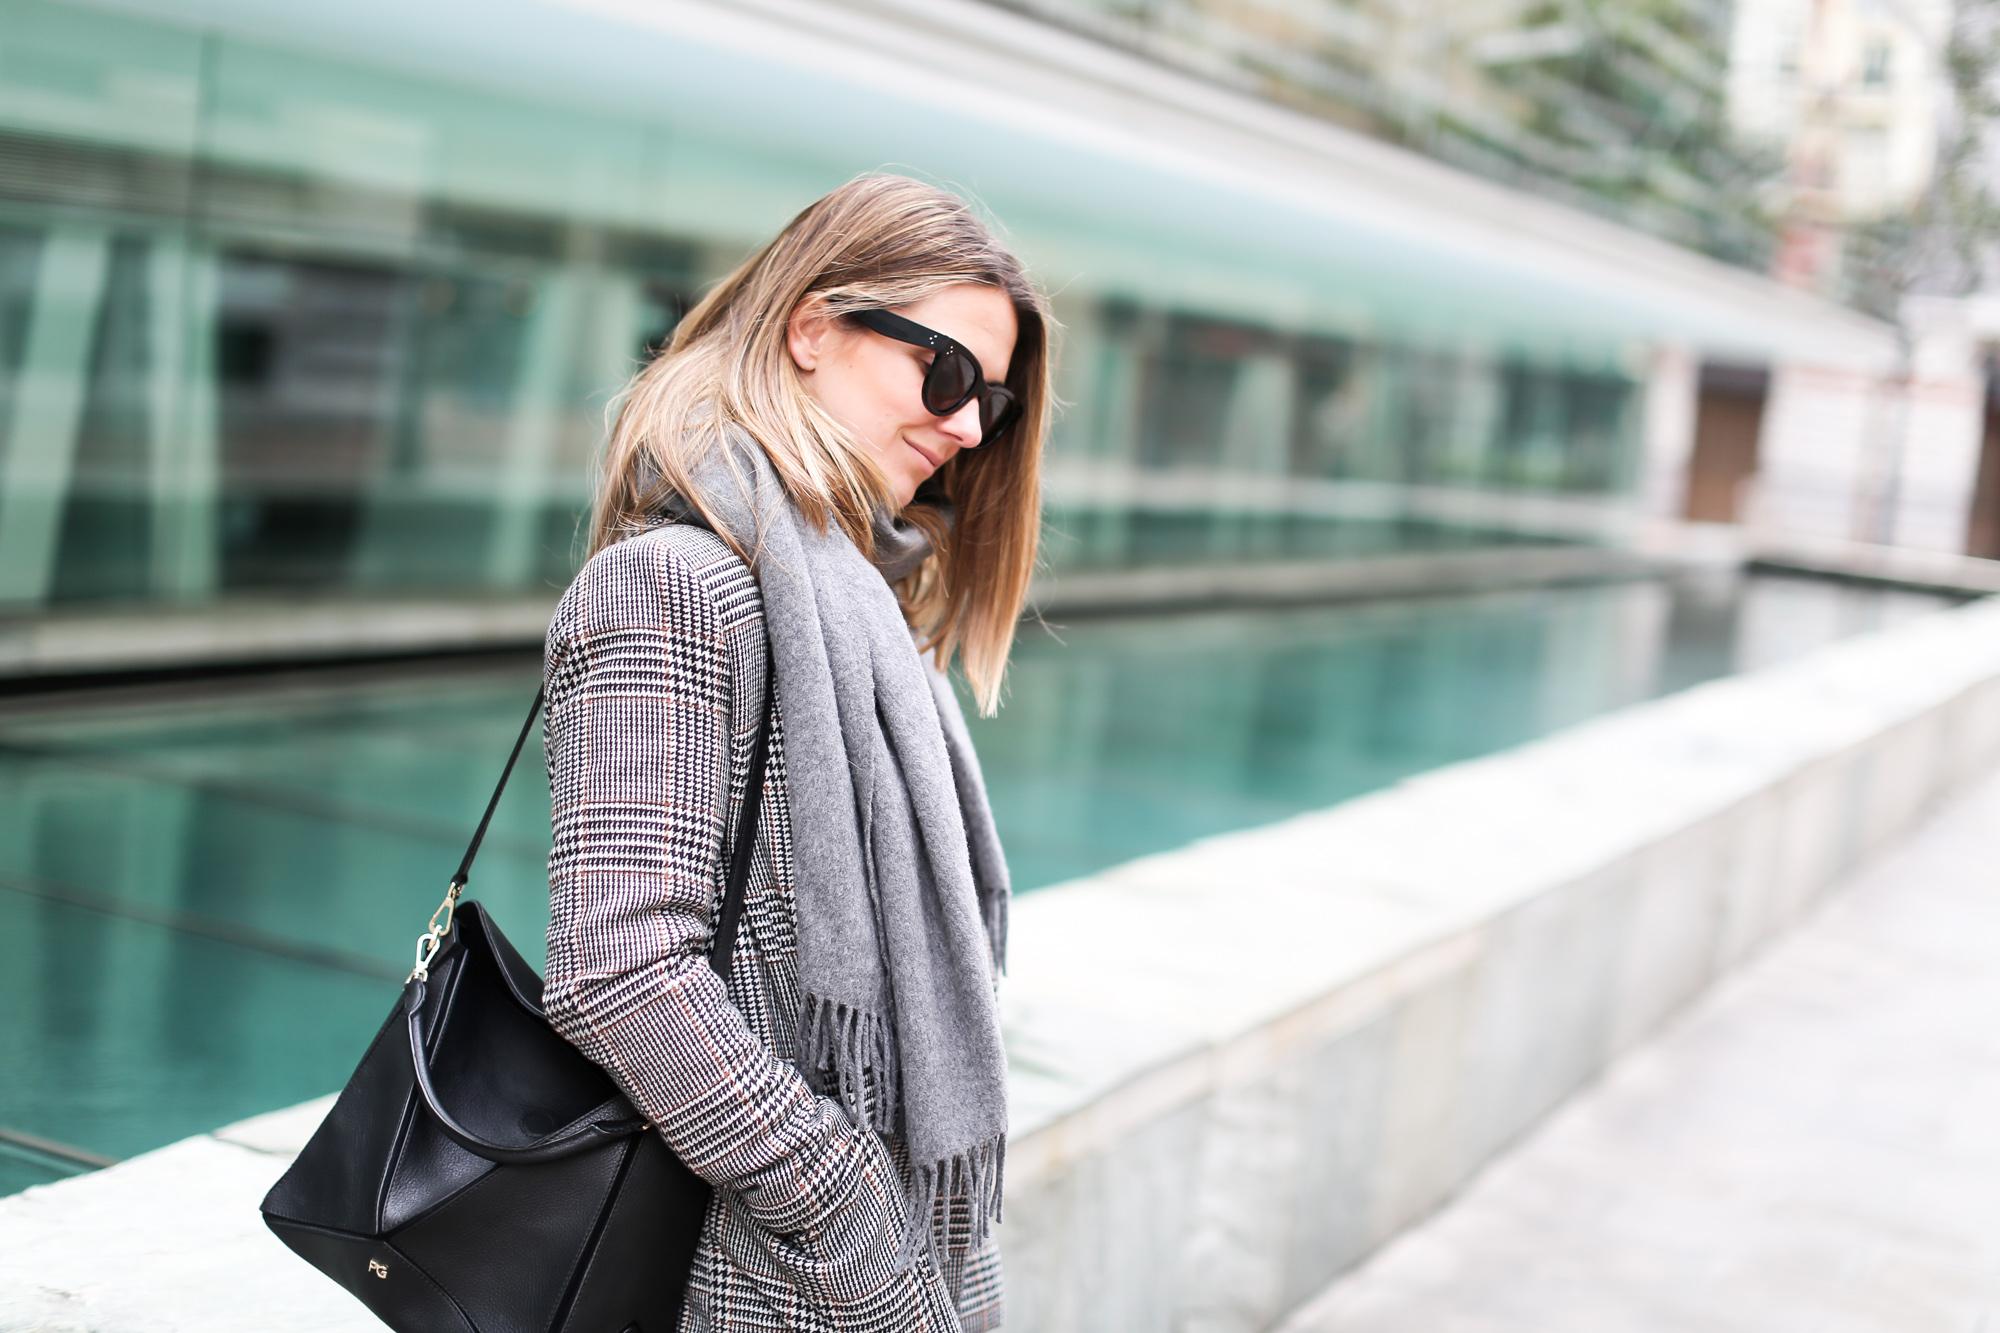 Clochet_streetstyle_fashionblogger_zapatosoxfordtachuelasPertini_bolsotangrampurificaciongarcia-6